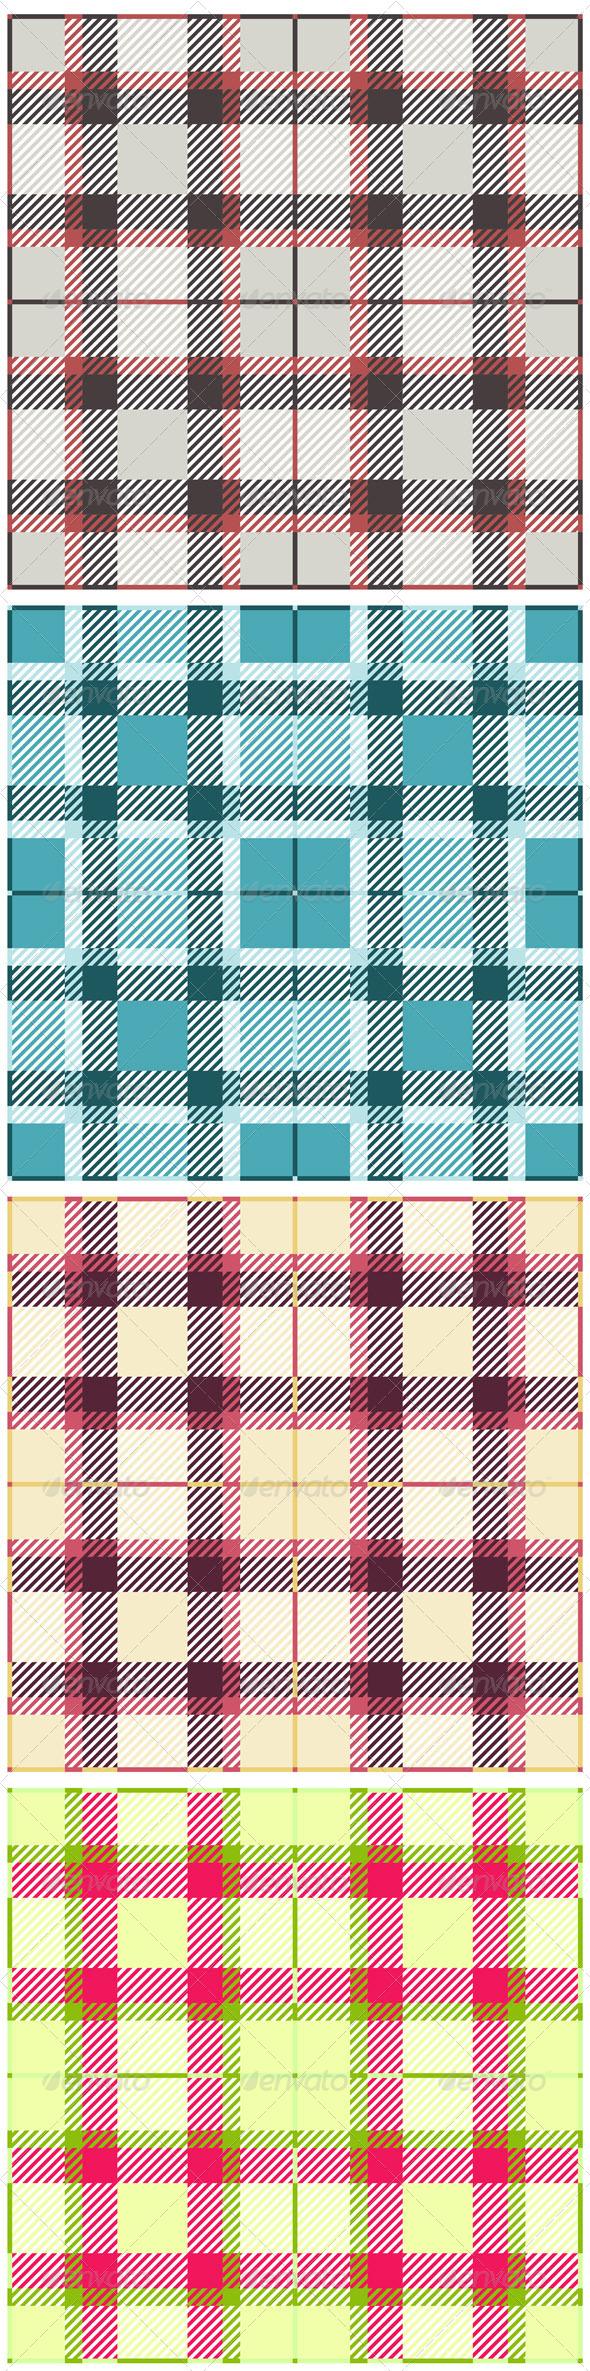 GraphicRiver Textile Patterns 4940429